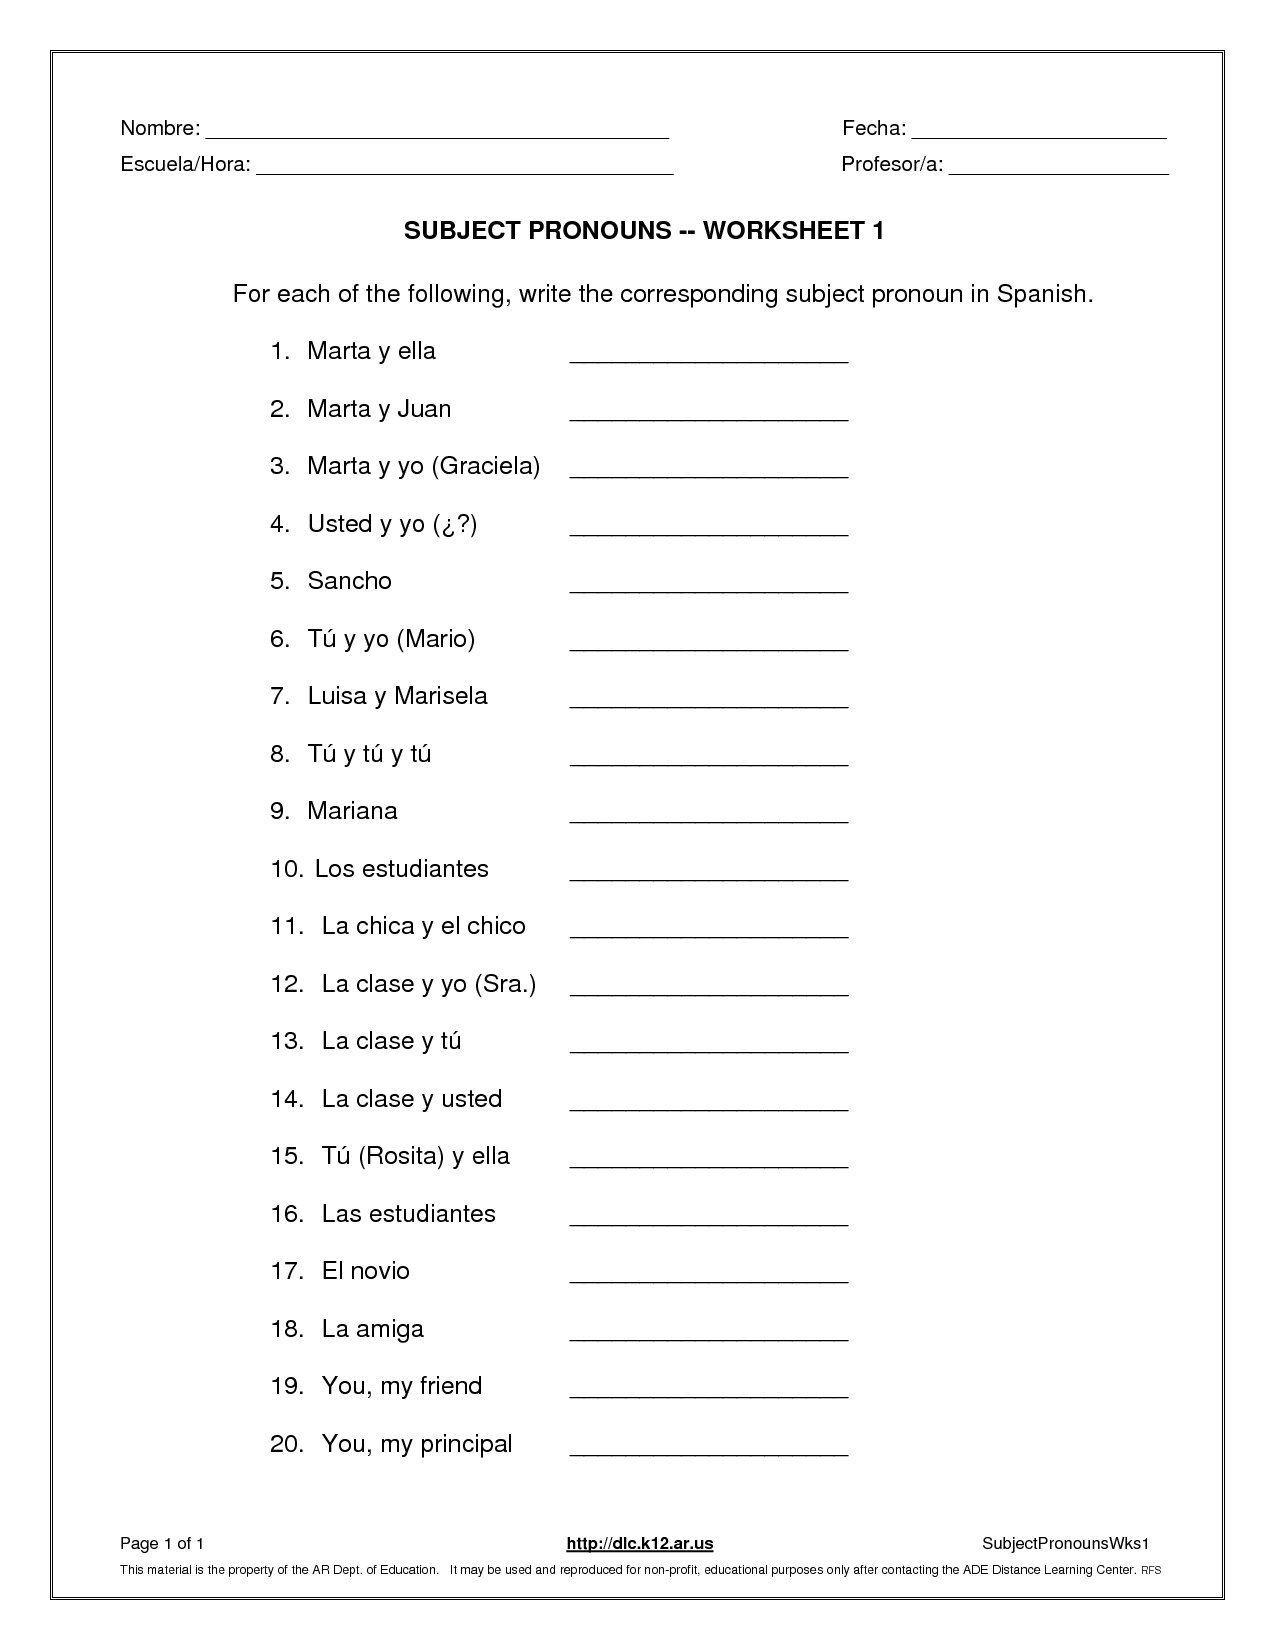 Subject Pronouns Worksheet 1 Spanish Answer Key Check More